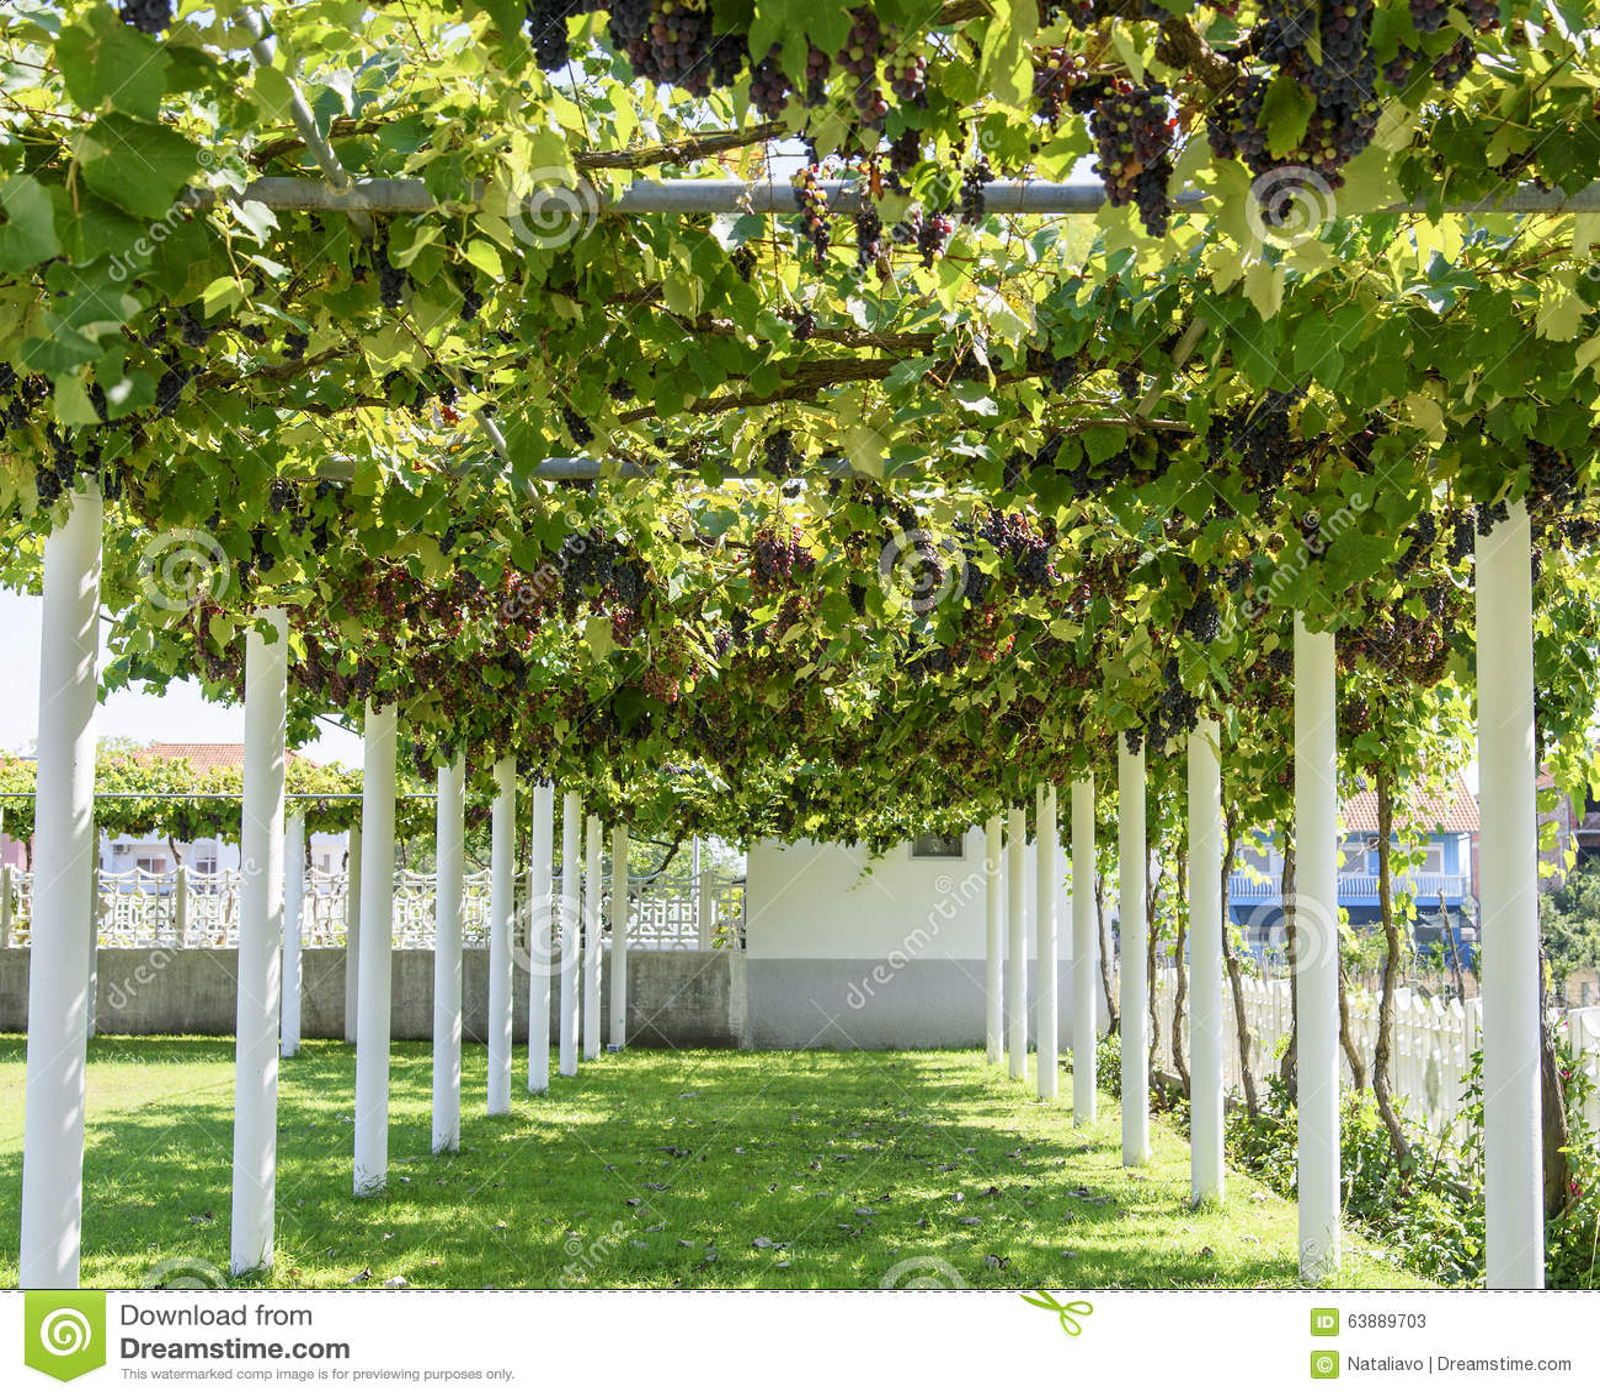 Alley With Grape Vine-covered Pergola Stock Photo - Image ...